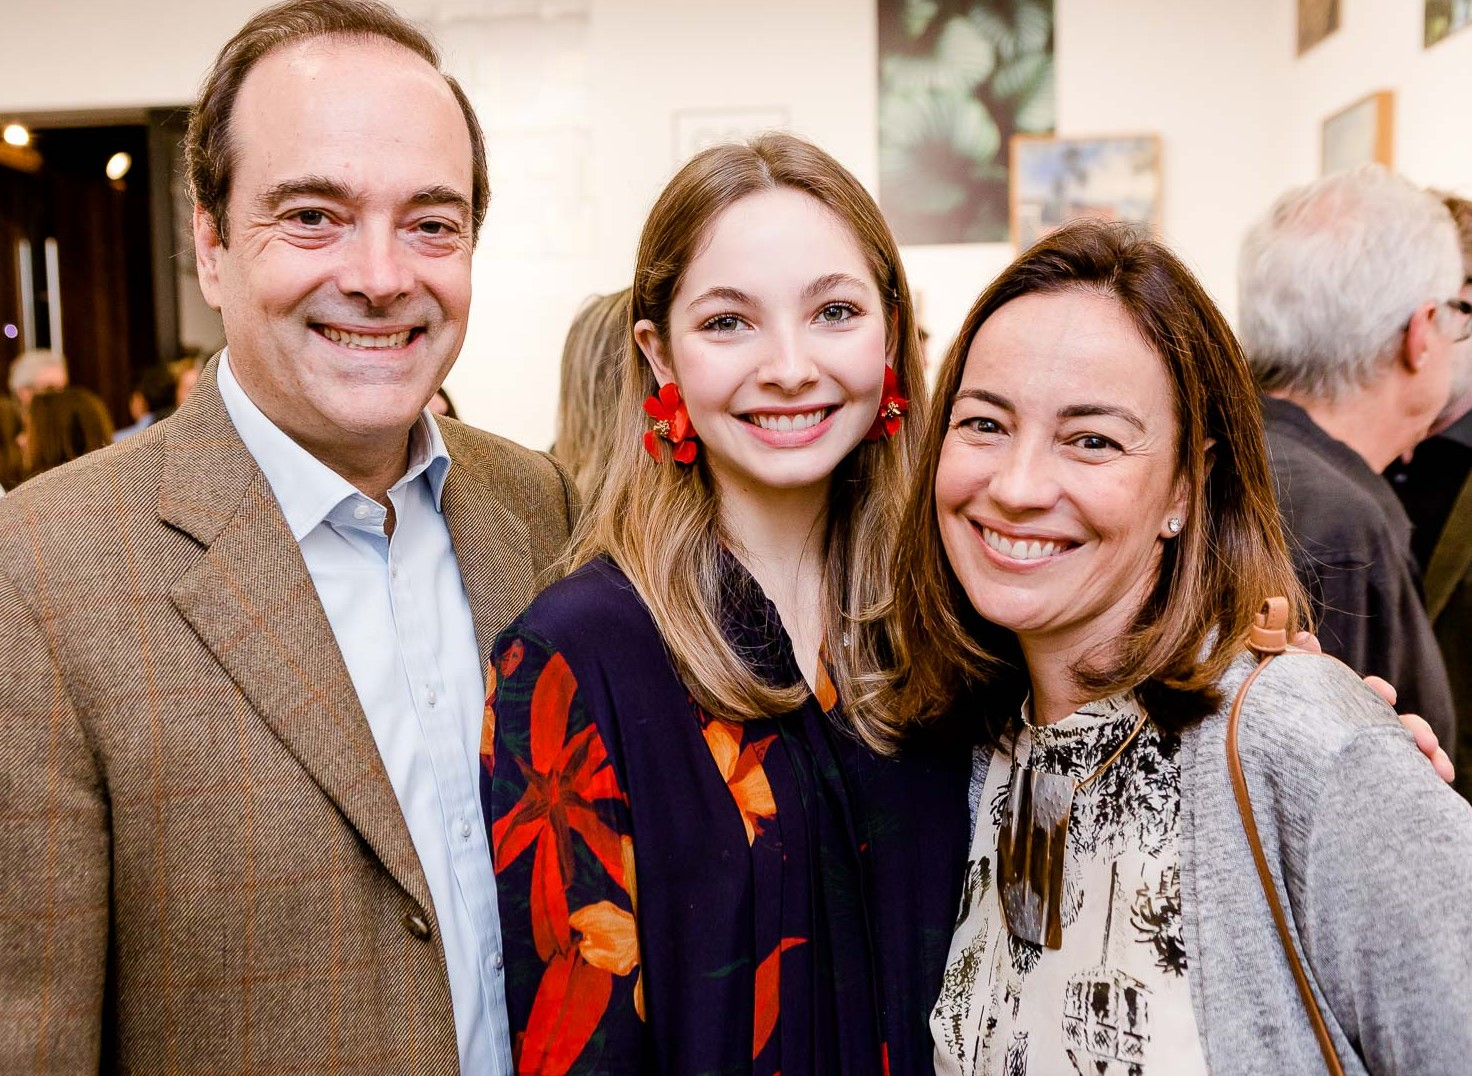 Carlos Roberto Osorio, Maria Osorio e Ana Luisa lobo  /Foto: Bruno Ryfer